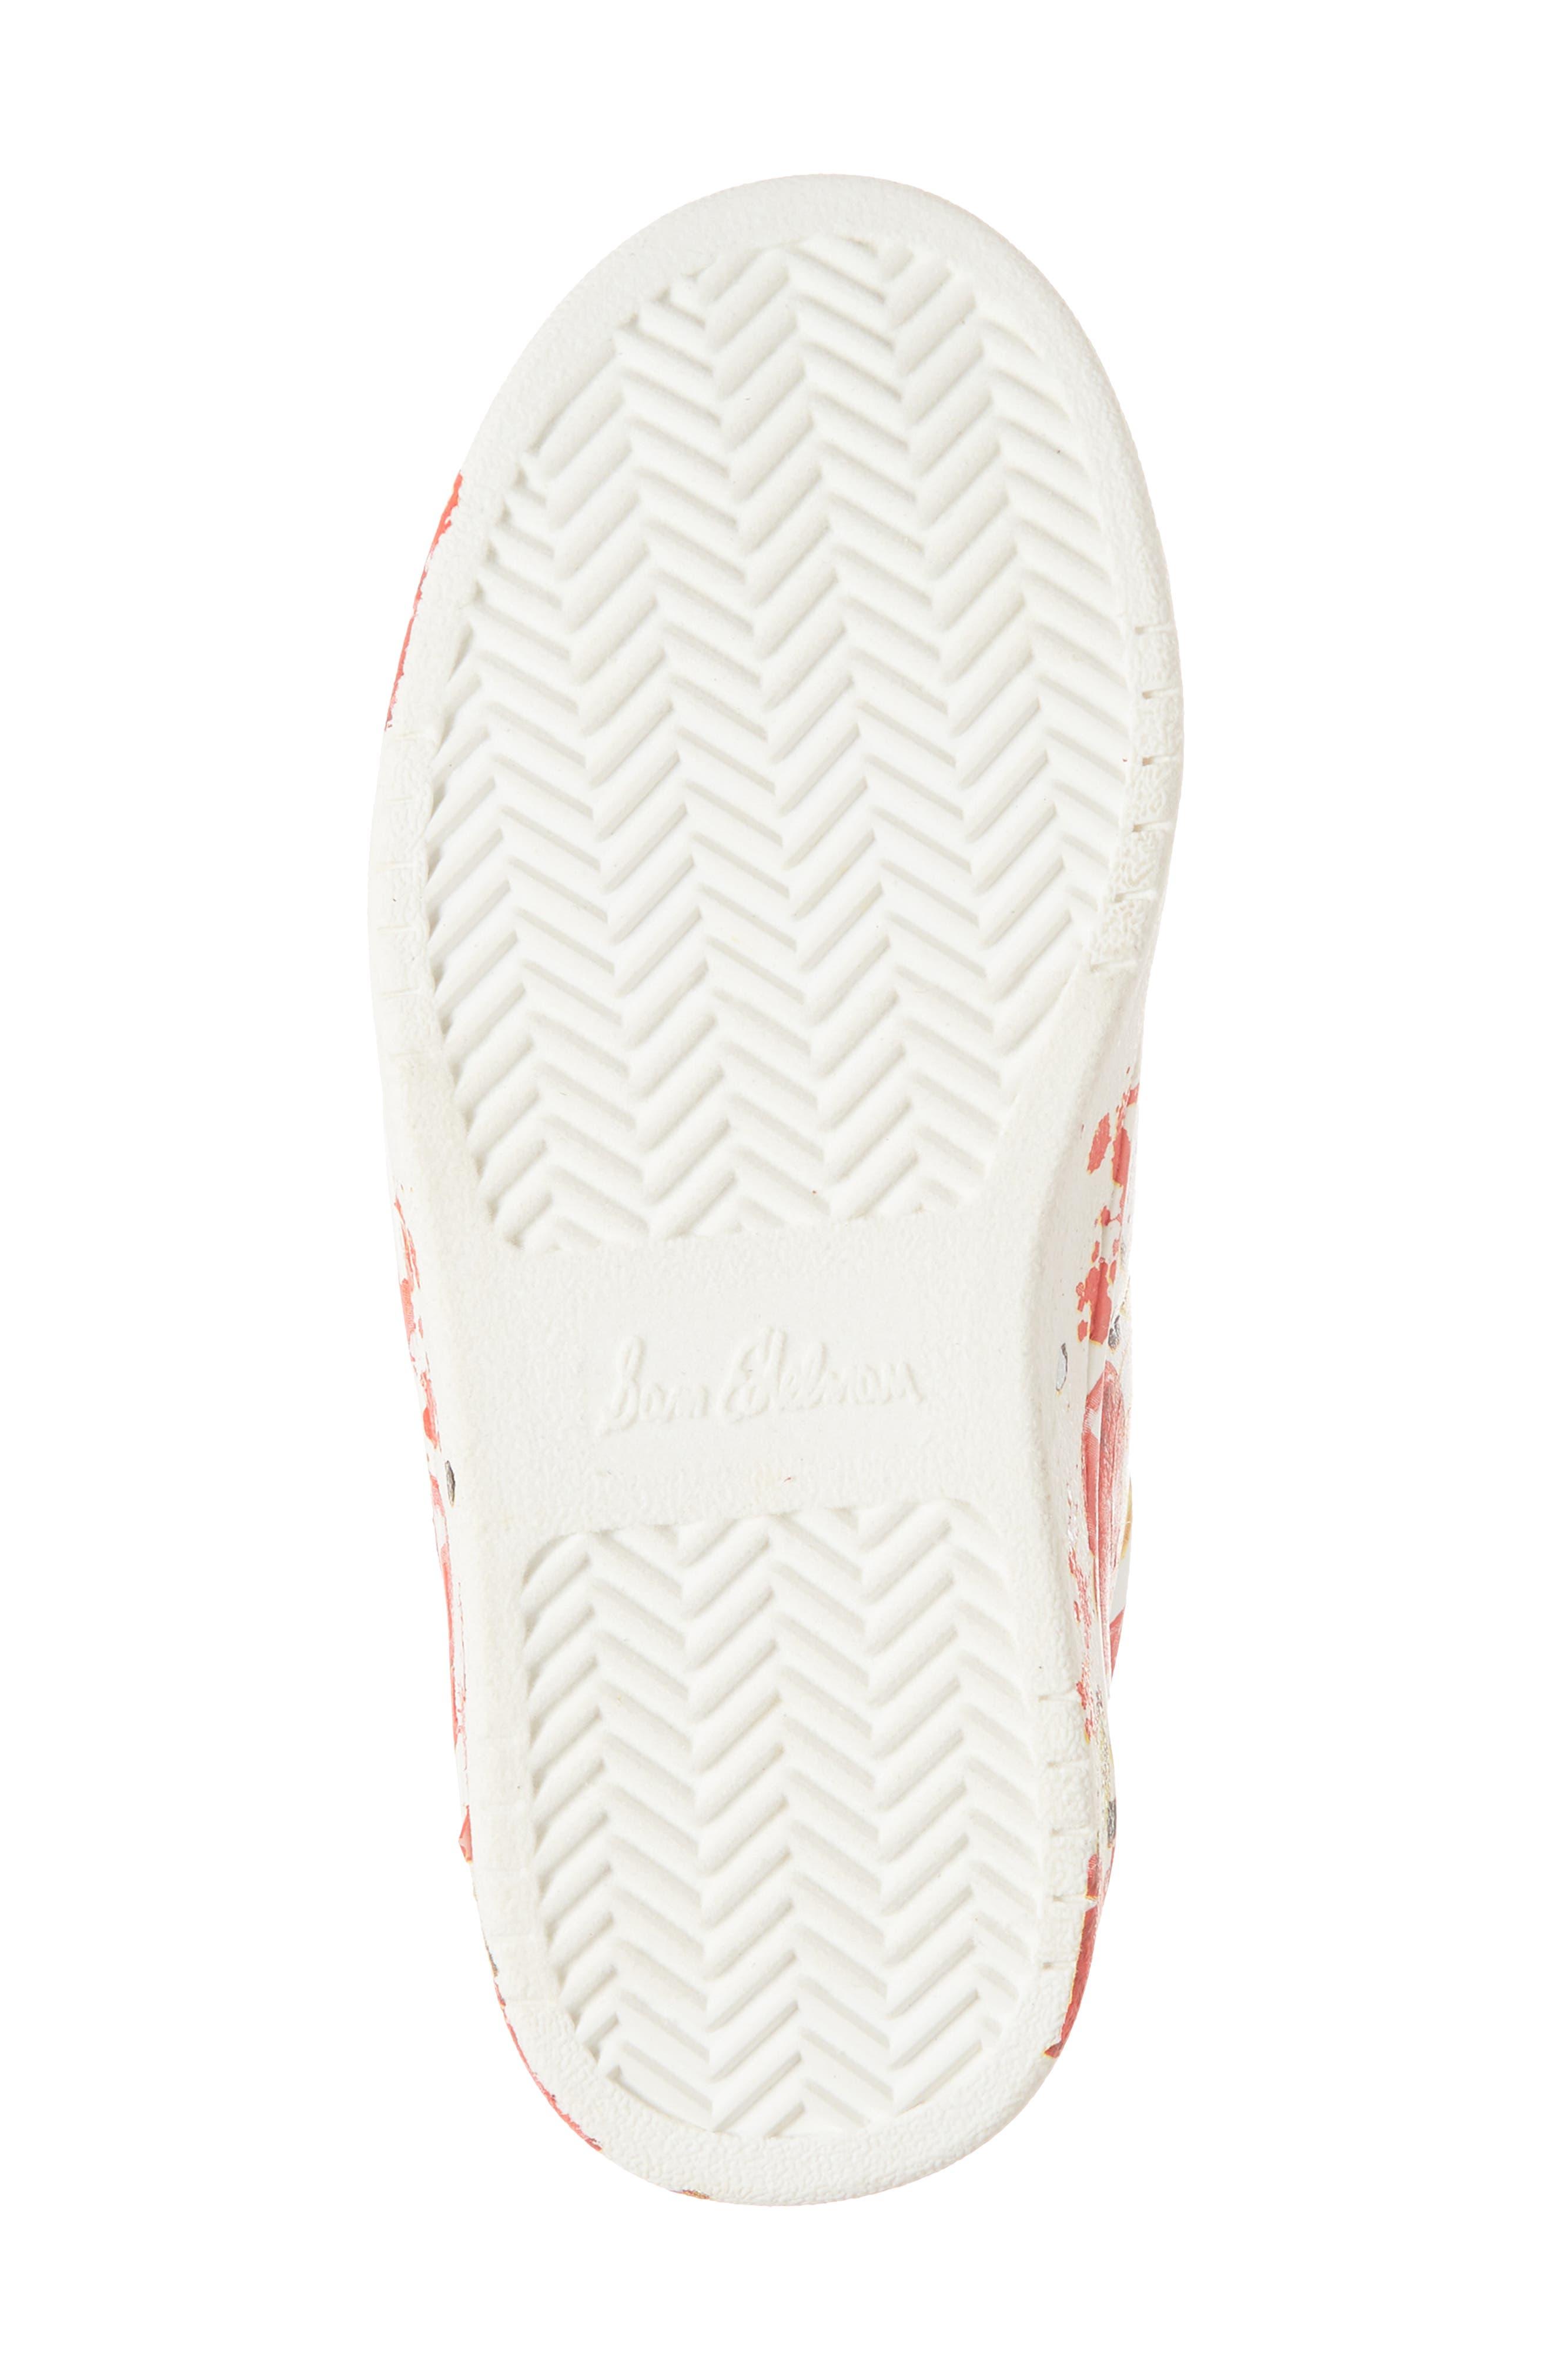 Blane Milford Fruit Print Sneaker,                             Alternate thumbnail 6, color,                             White/ Cherry Faux Leather